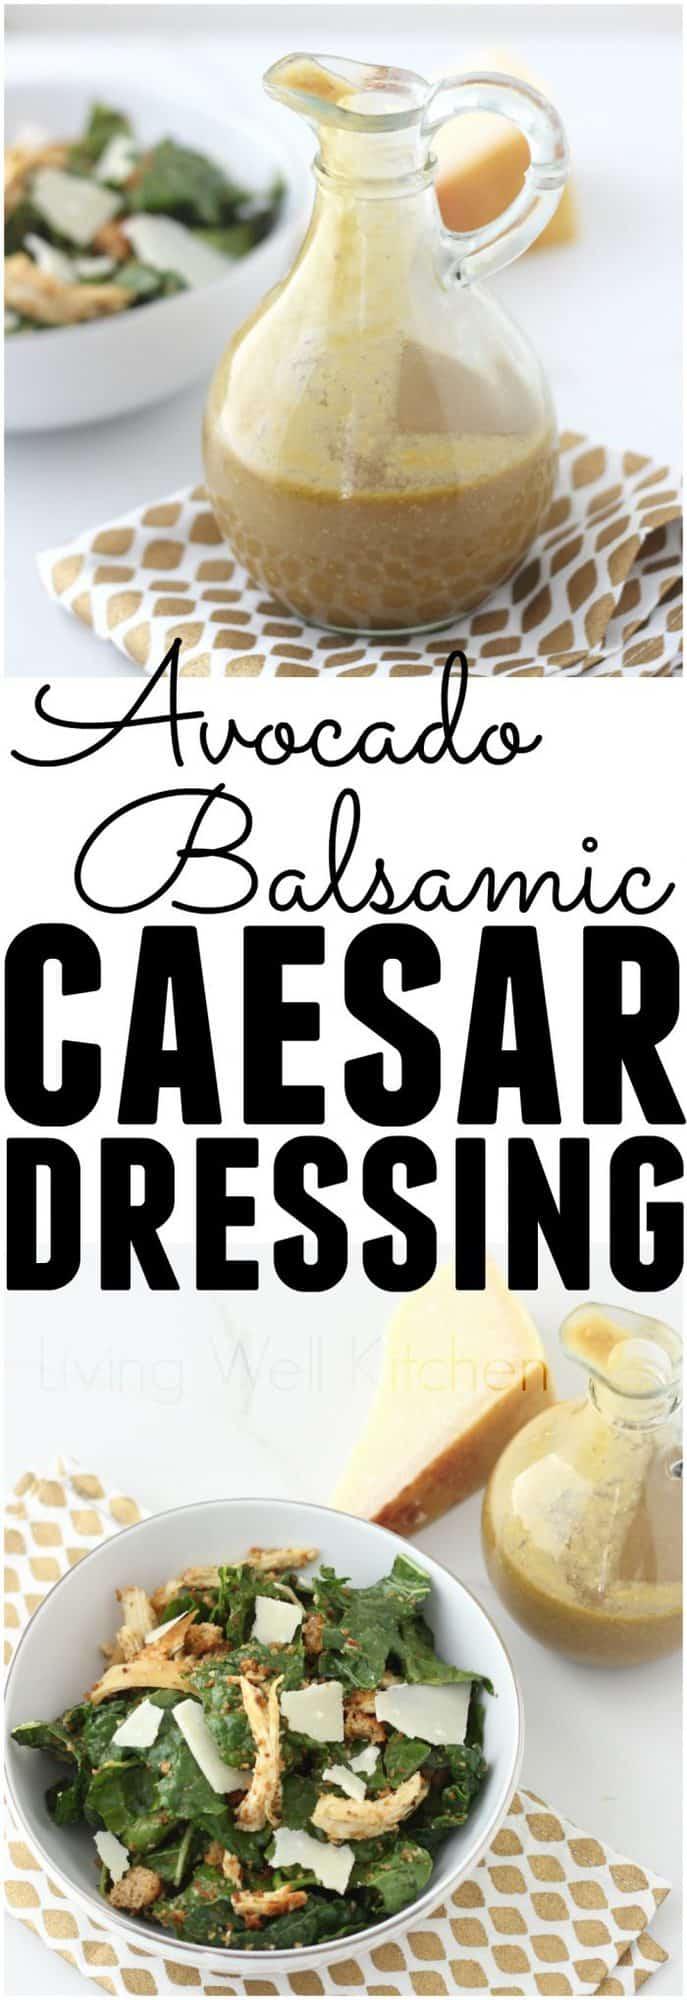 Avocado Balsamic Caesar Dressing